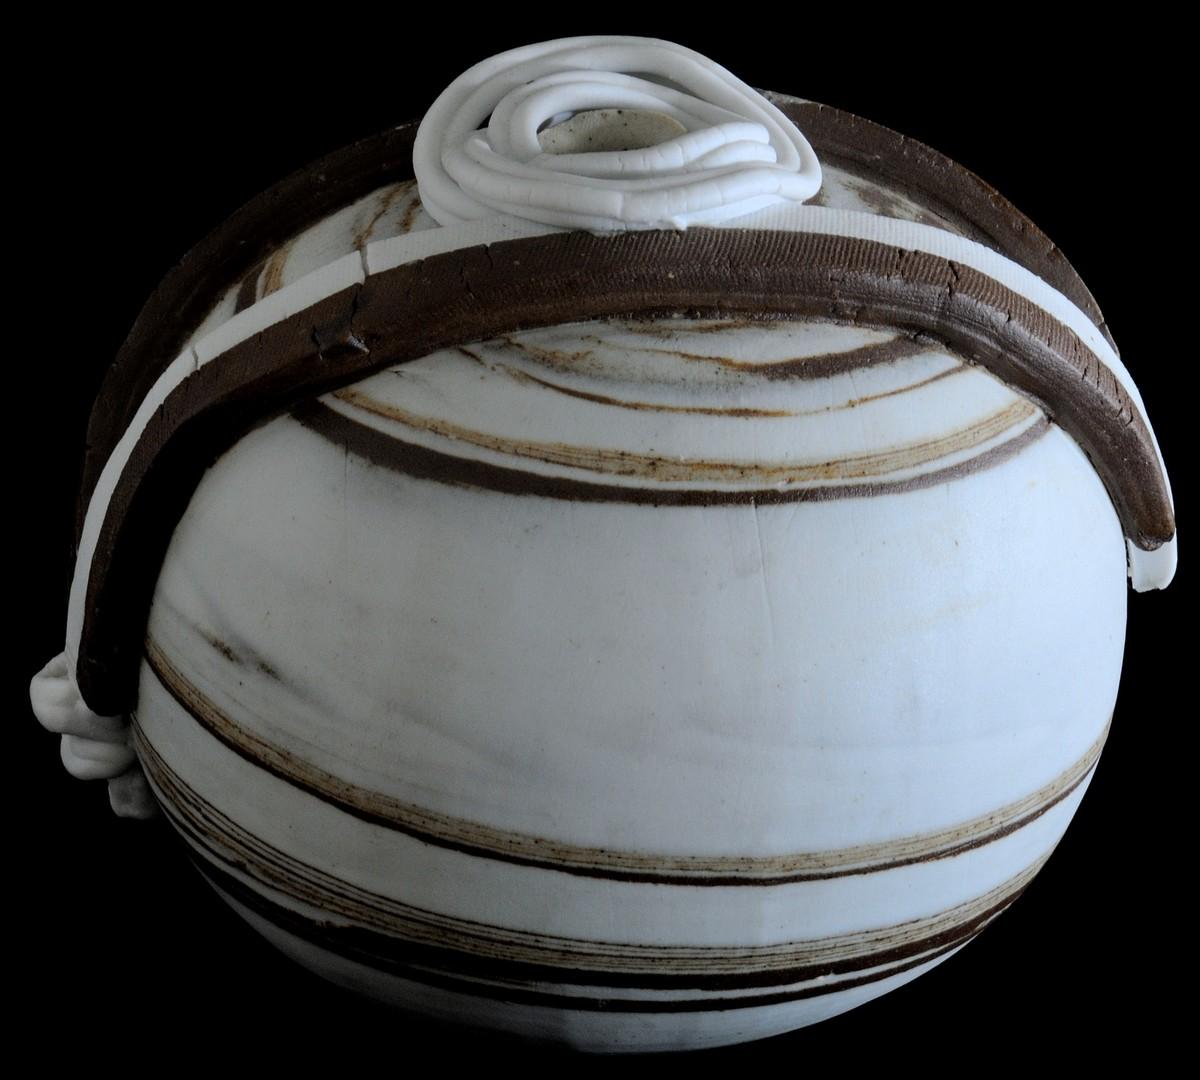 DESERT WINDS by Usha Garodia, Art Deco Sculpture | 3D, Ceramic, Gray color